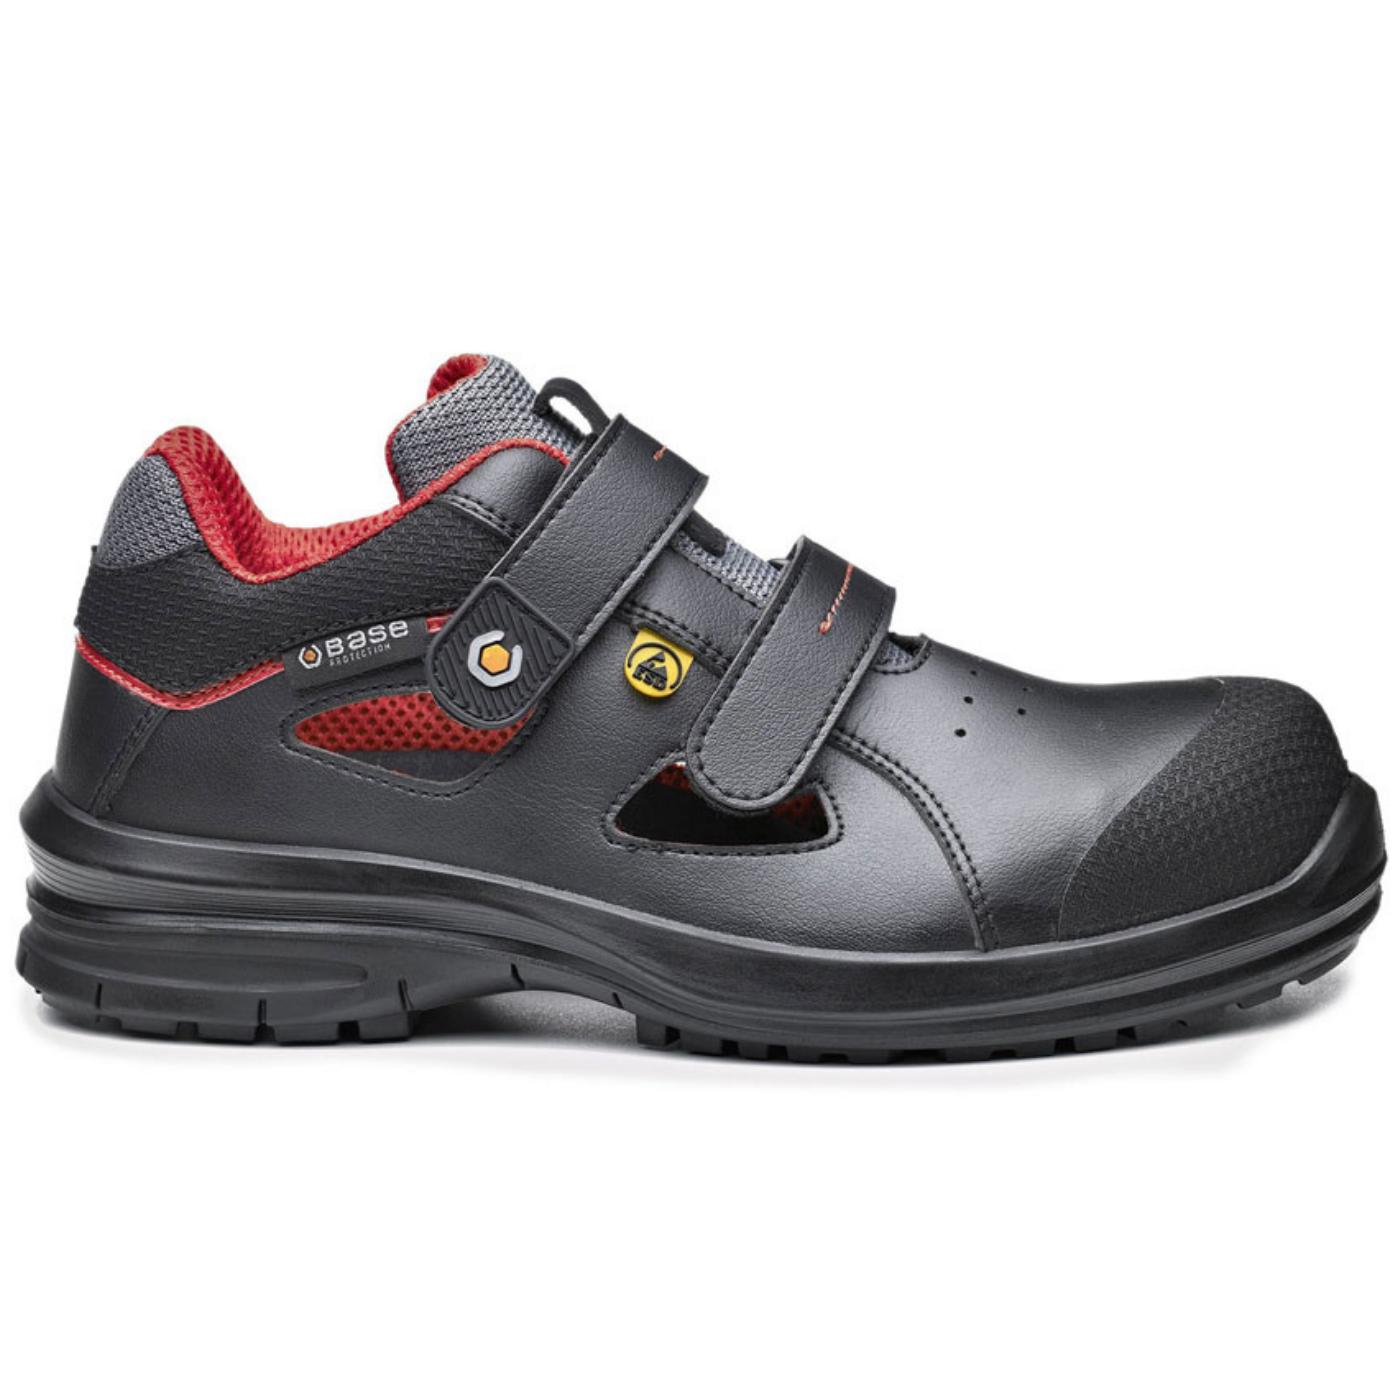 Sandały robocze Base B0955 – Skat